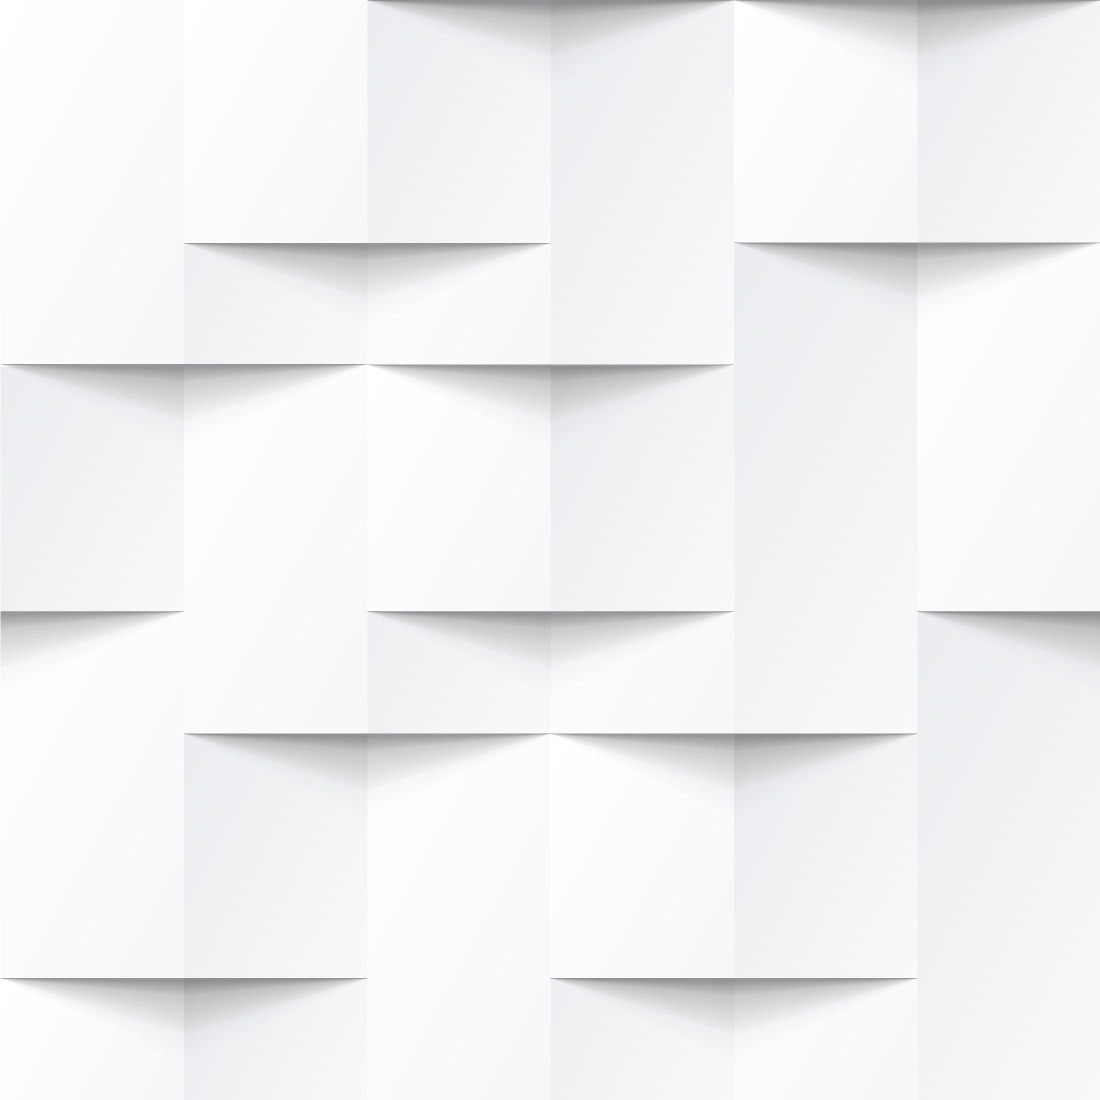 Papel de Parede 3D Camadas Abstratas